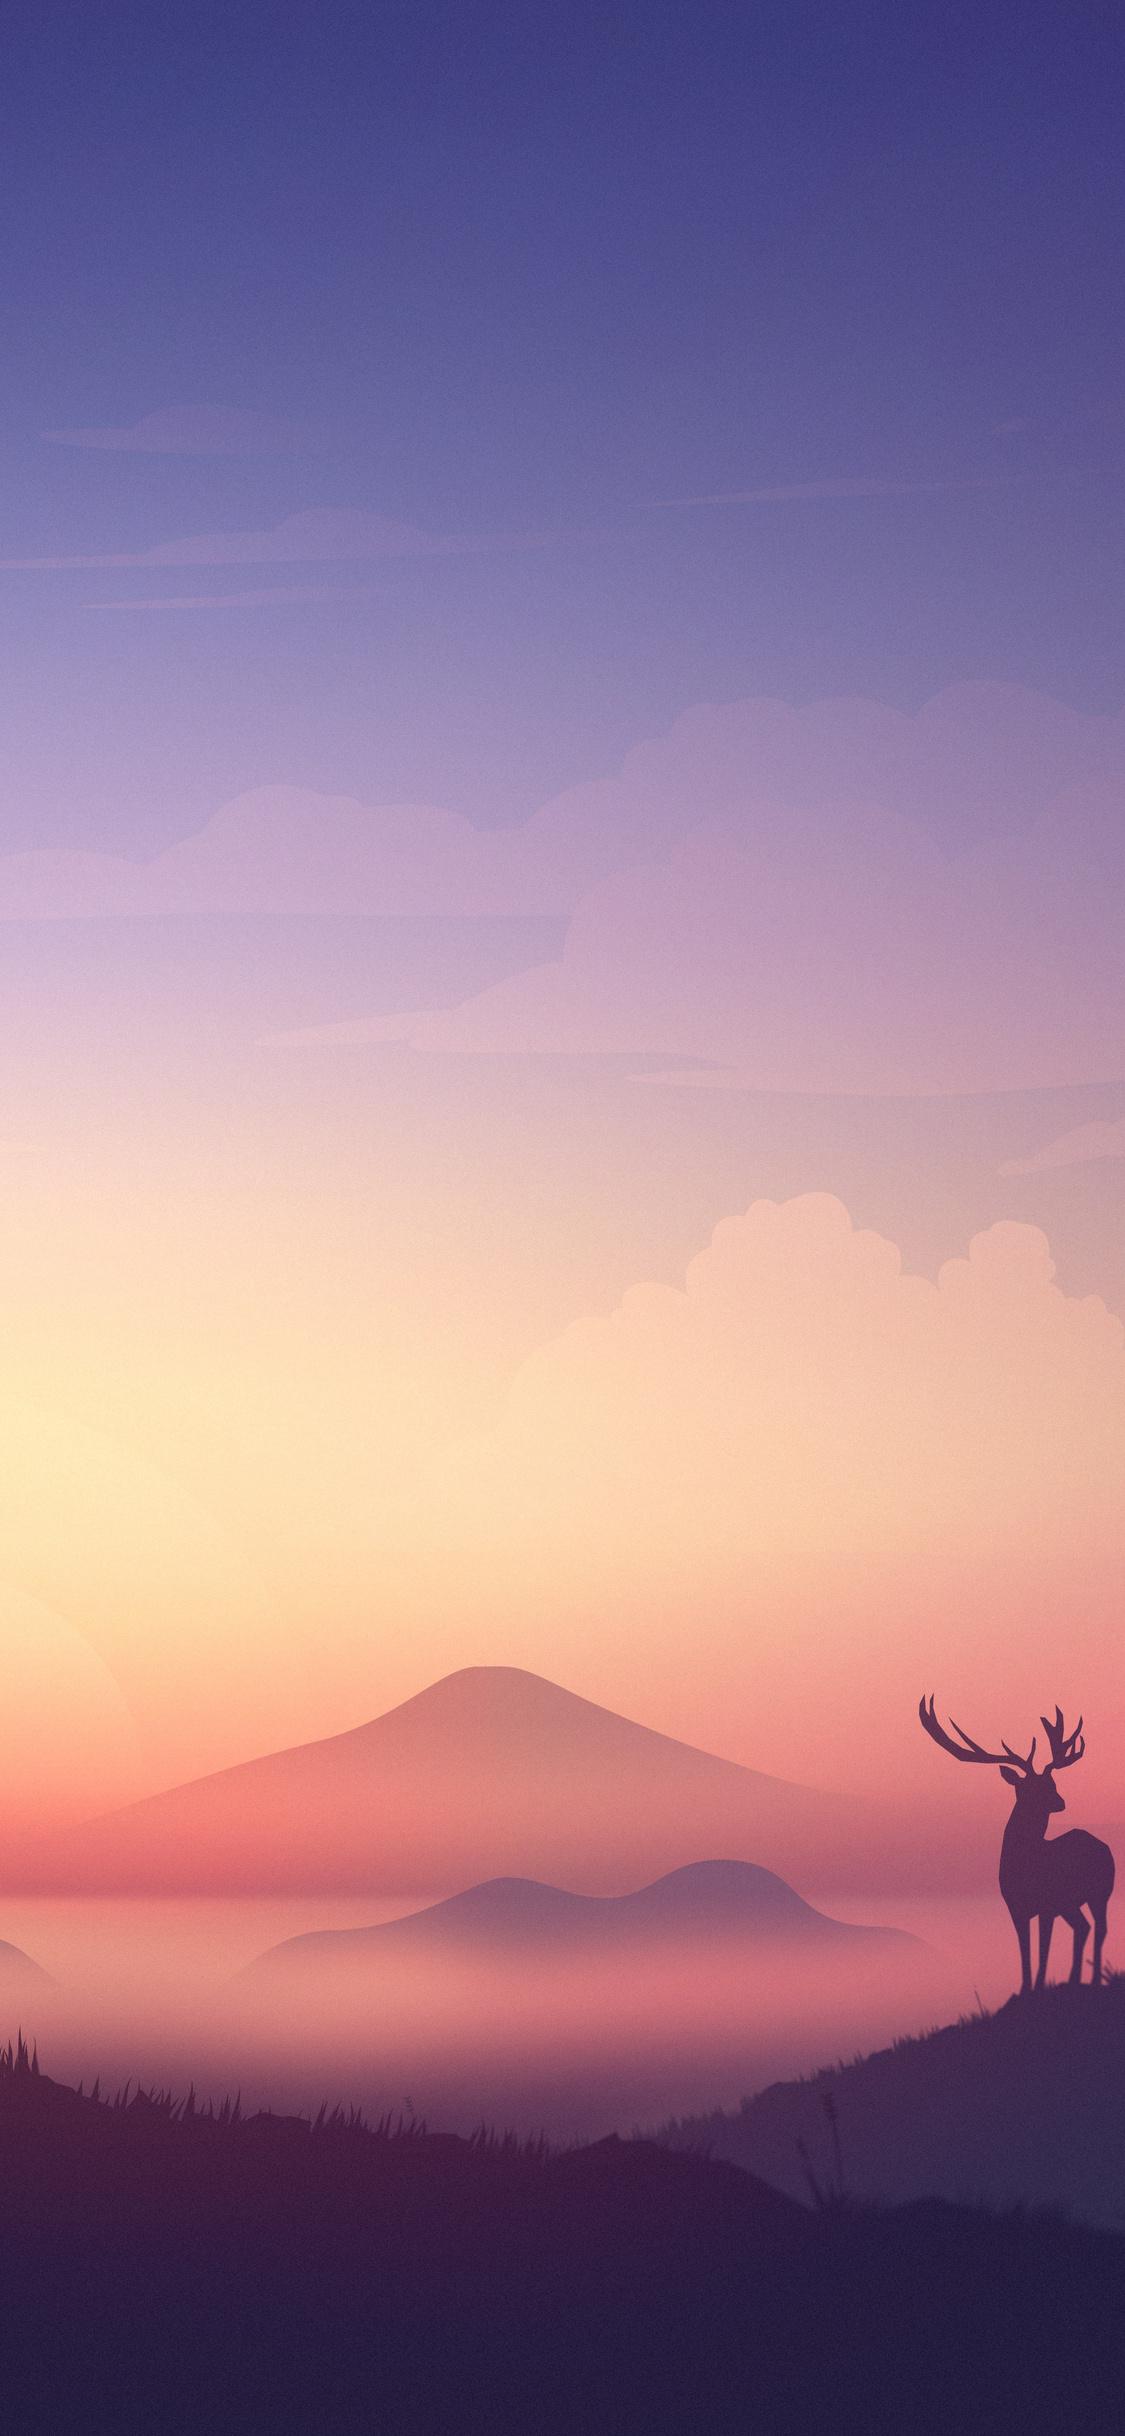 1125x2436 Bear Deer Mountains Sunrise Minimalism Artwork 8k Iphone